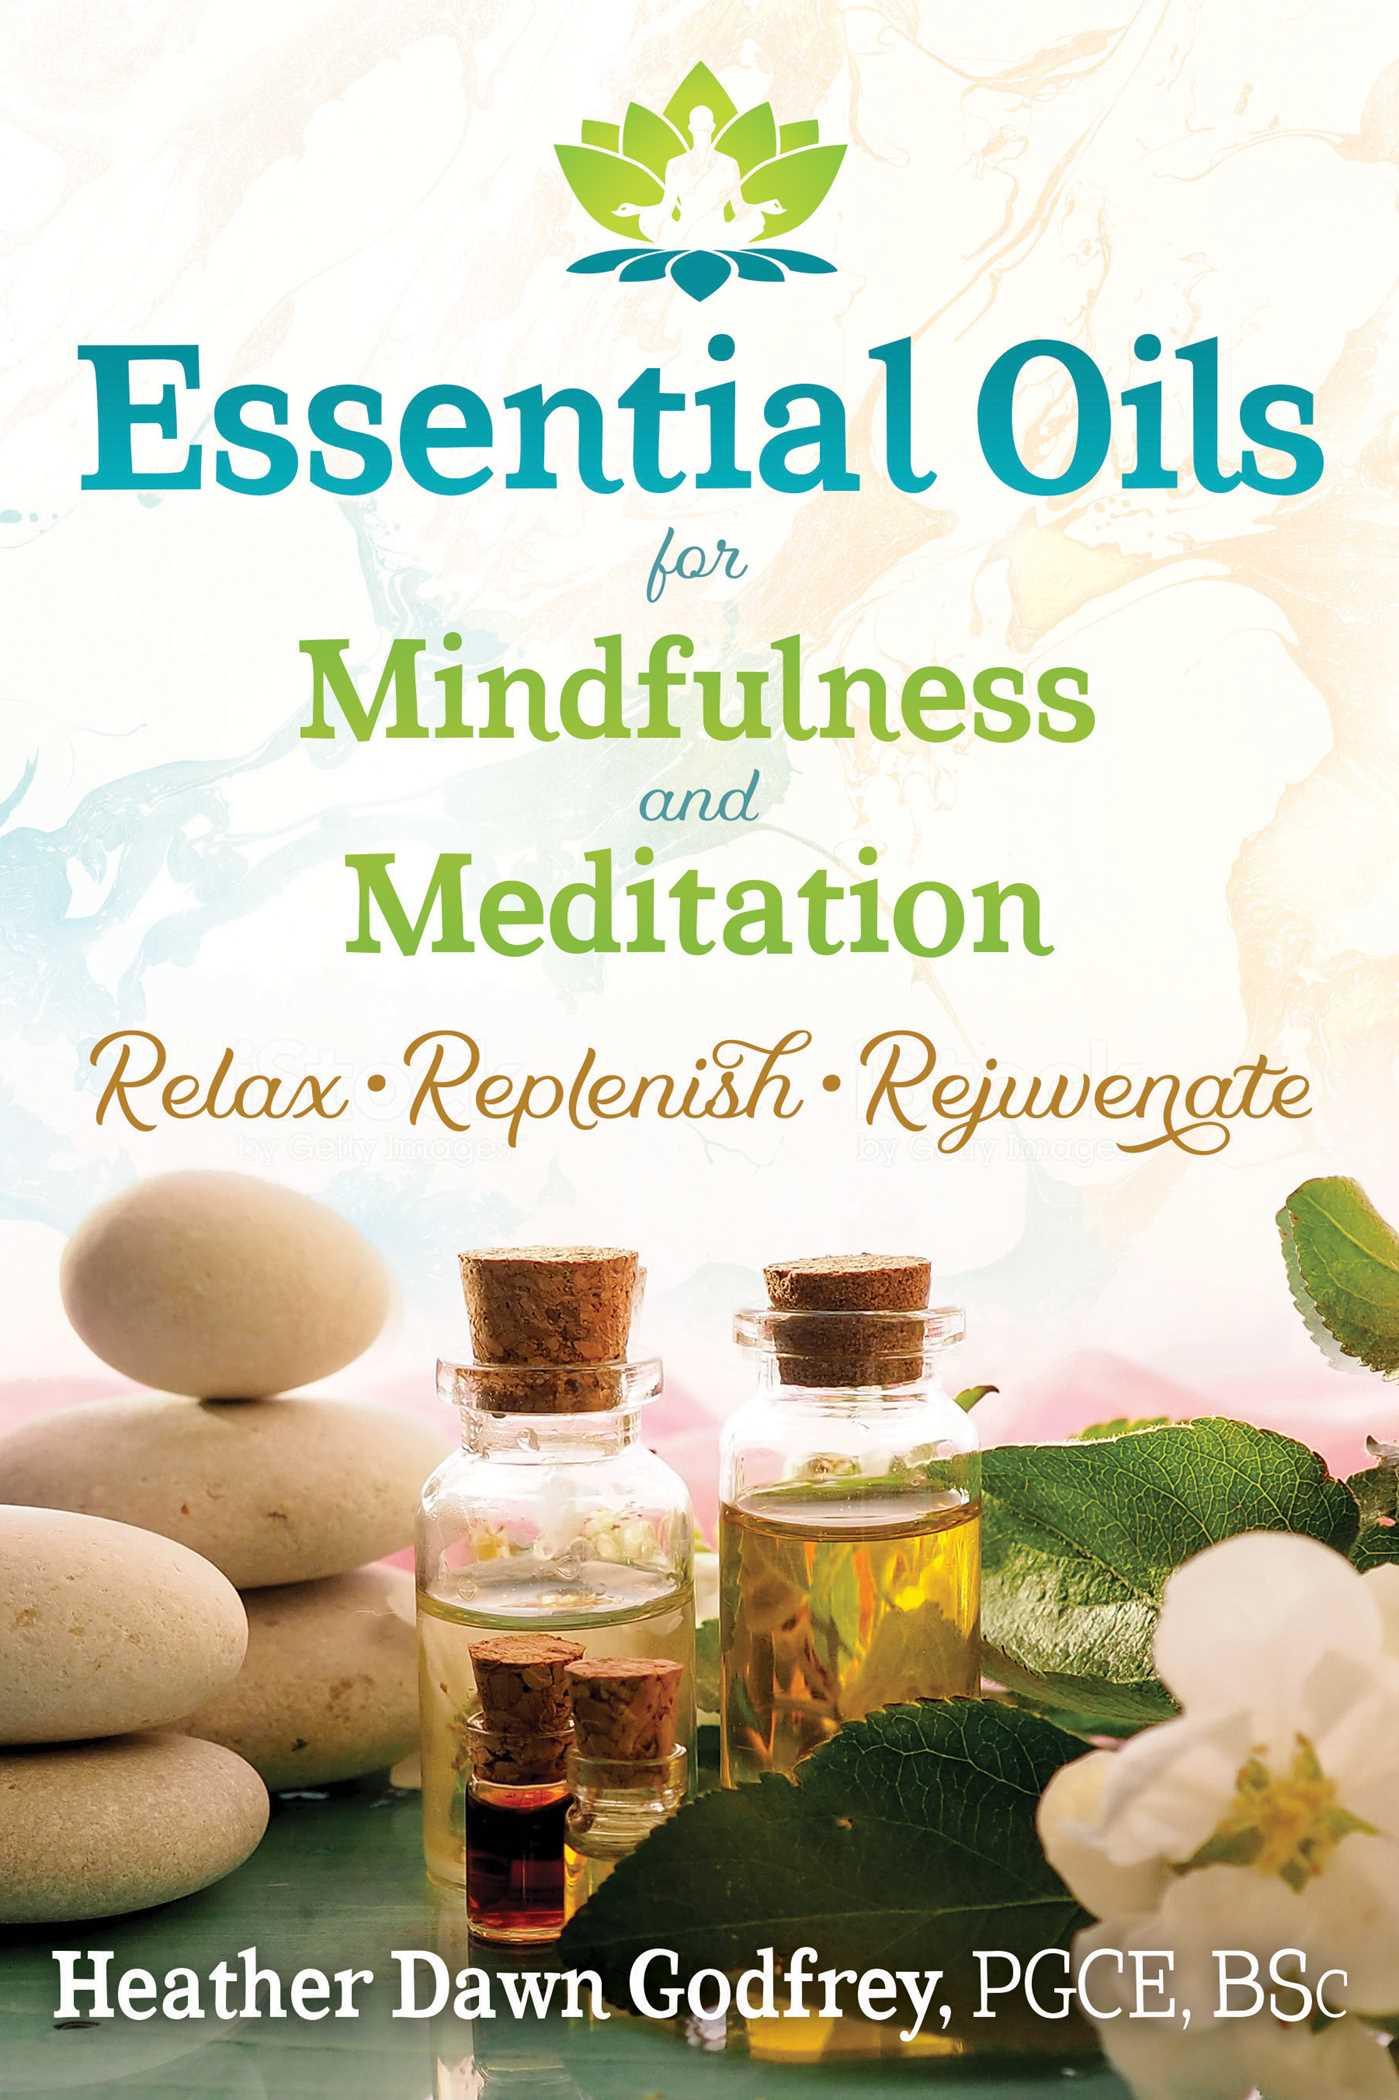 Essential oils for mindfulness and meditation 9781620557624 hr